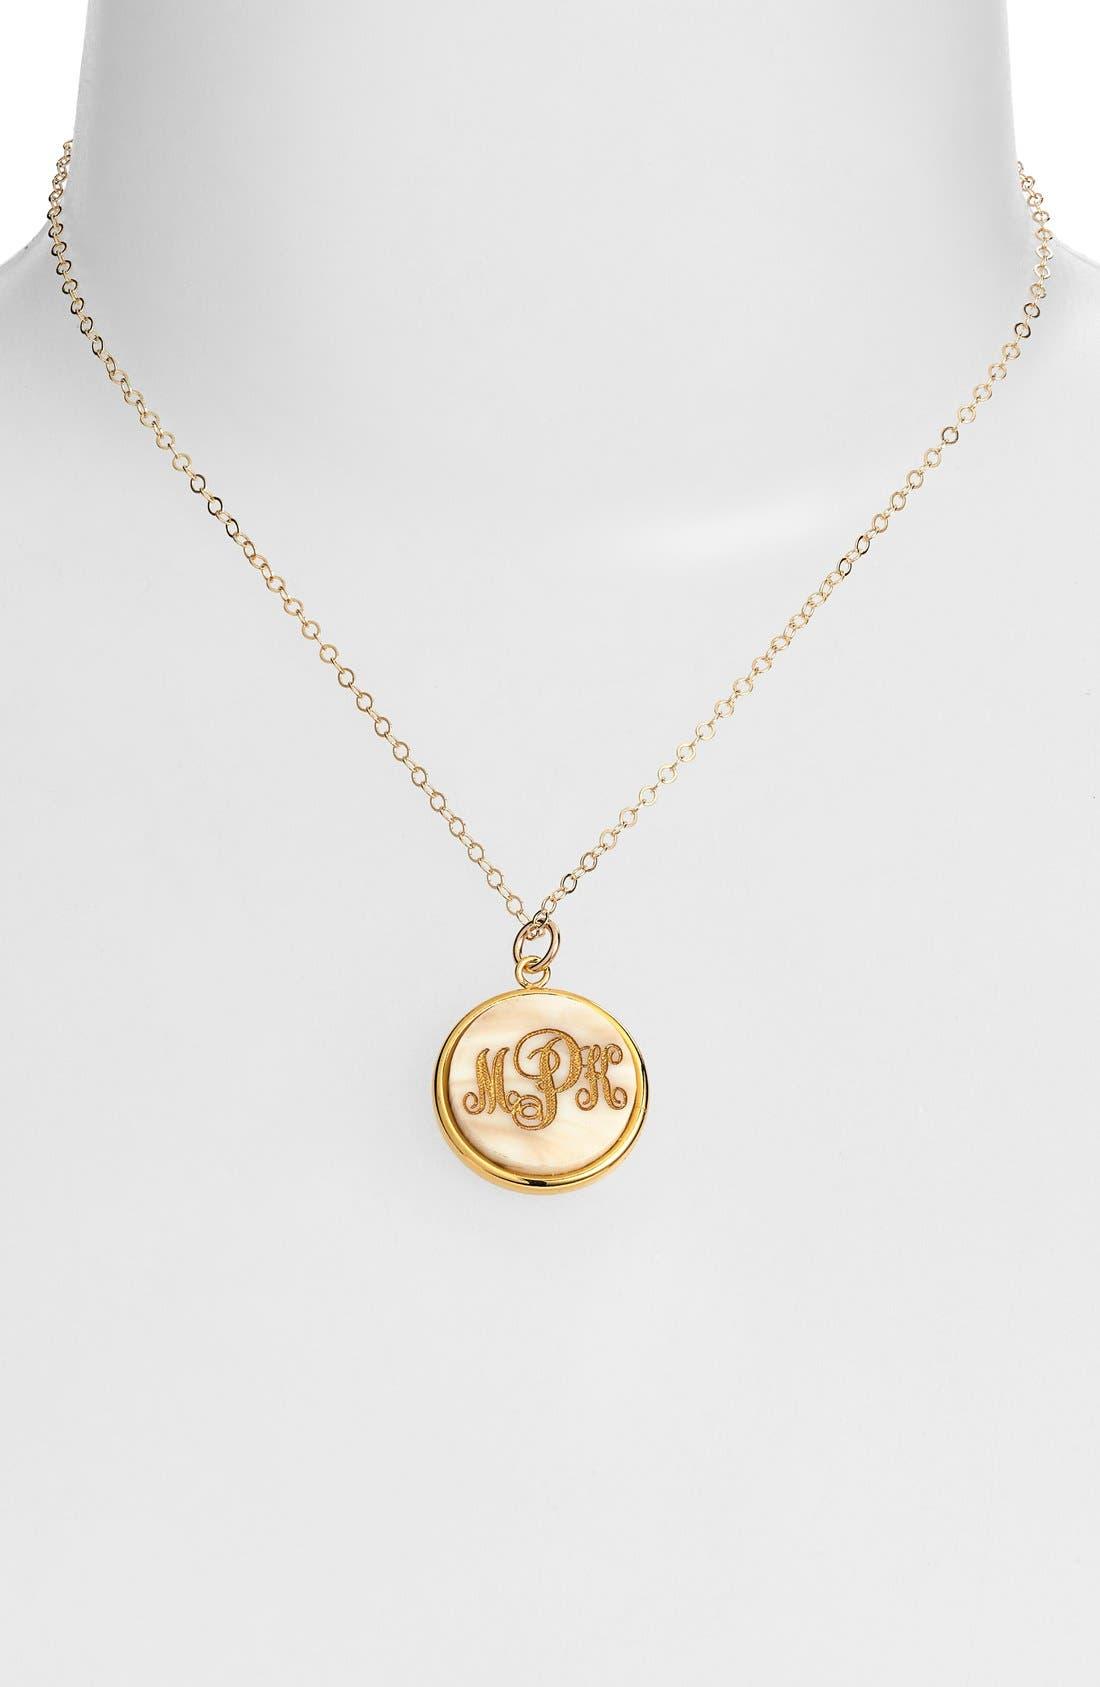 'Vineyard' Personalized Monogram Pendant Necklace,                             Alternate thumbnail 5, color,                             900